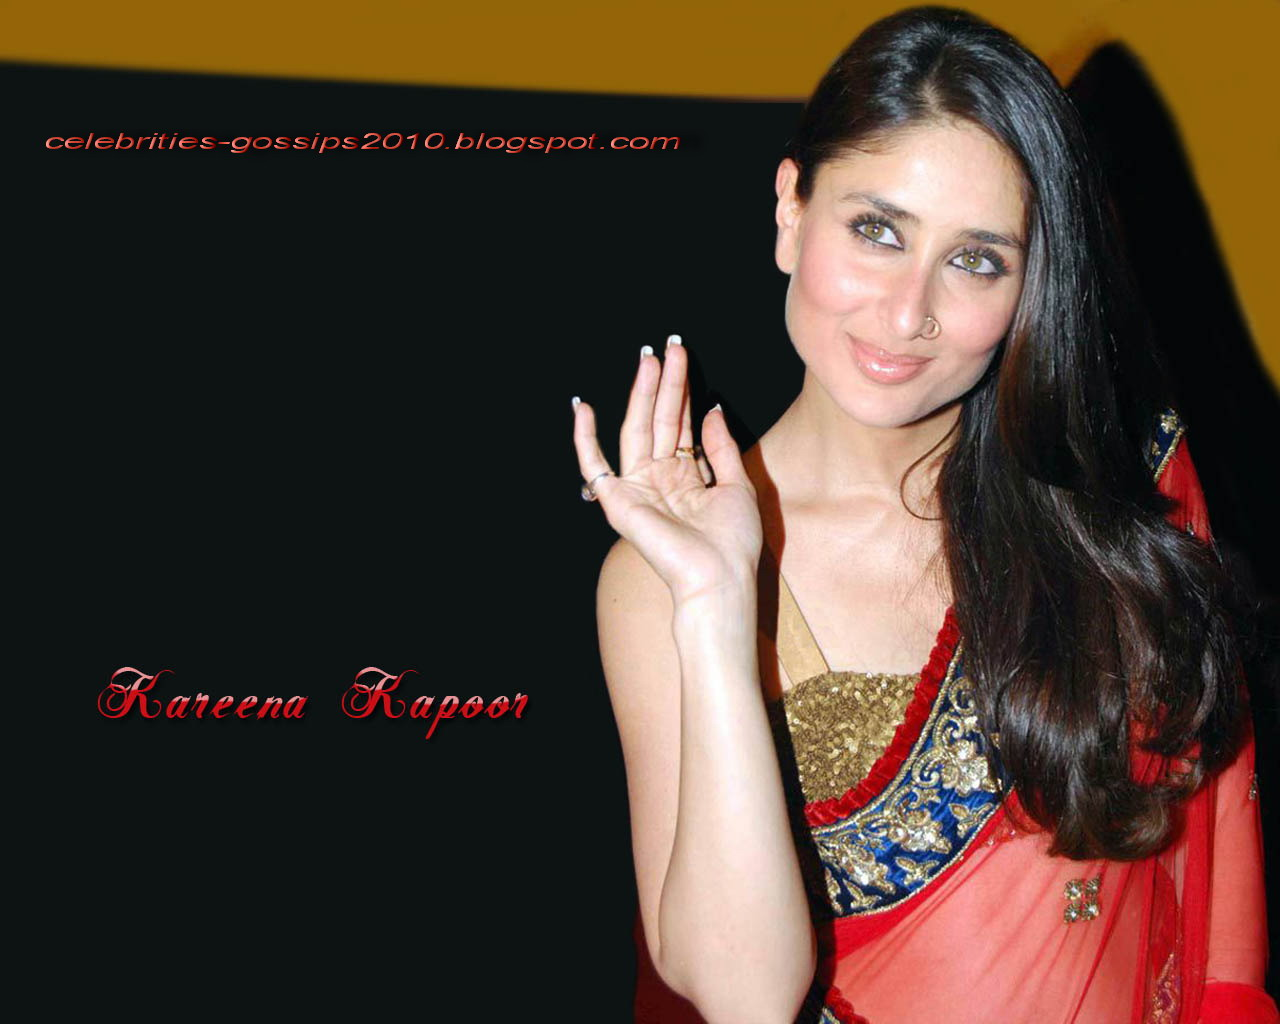 http://3.bp.blogspot.com/_9KHB1qdgTys/TMrtIKUfCeI/AAAAAAAAAOg/3AXy8cwch5c/s1600/Kareena-Kapoor-Hello-Wallpaper.jpg